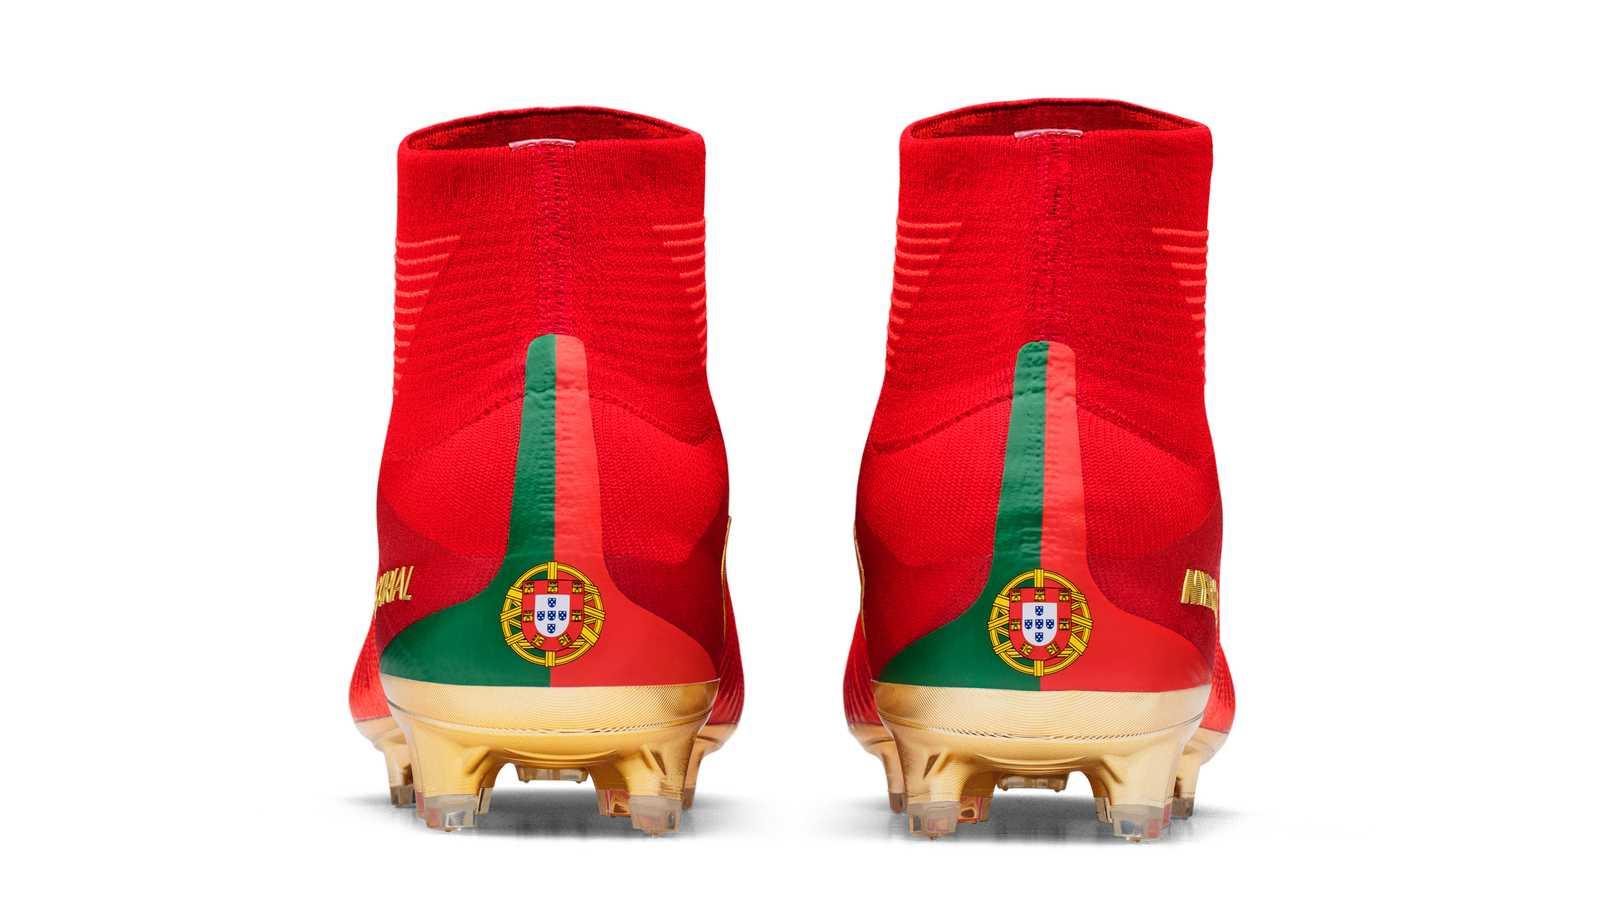 Discover Cristiano Ronaldo's Nike Limited Edition Boots Limited Edition Discover Cristiano Ronaldo's Nike Limited Edition Boots nike mercurial superfly v cristiano ronaldo campeoes boots 5